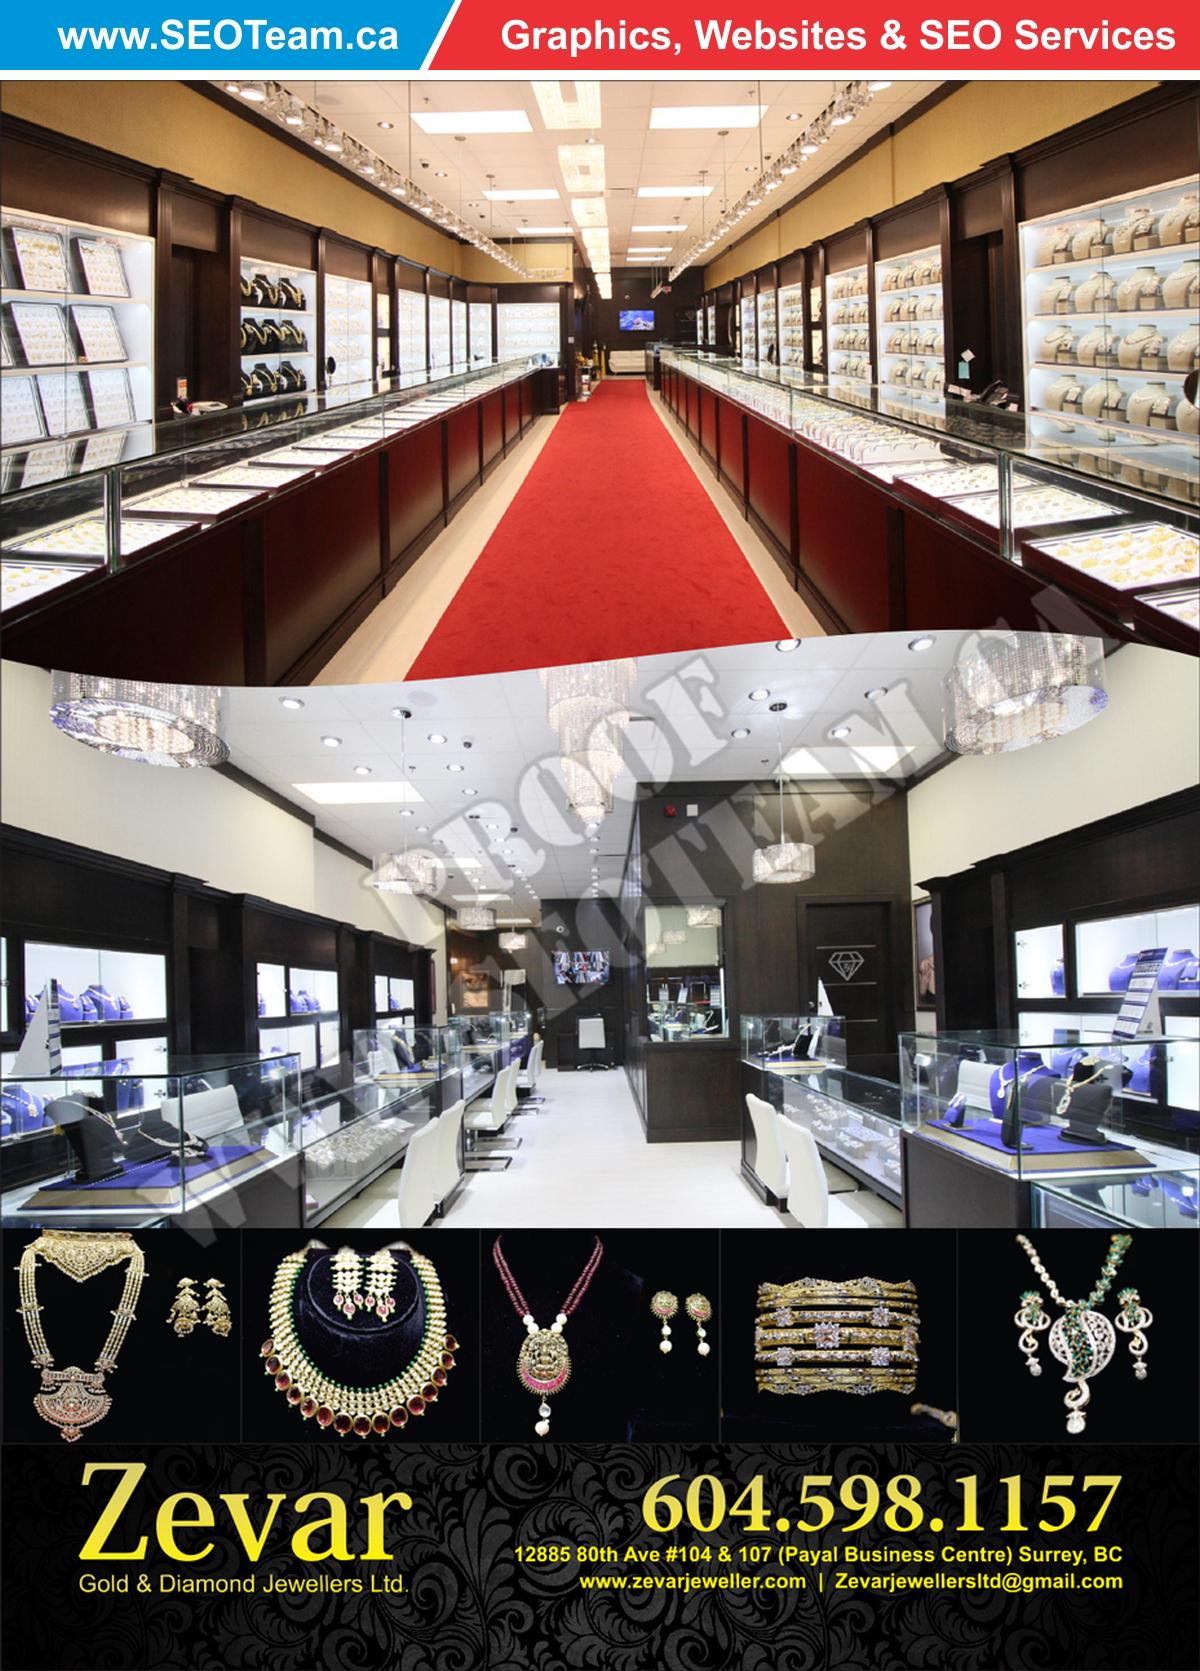 Zevar Jewellars - Design By SEOTeam.ca